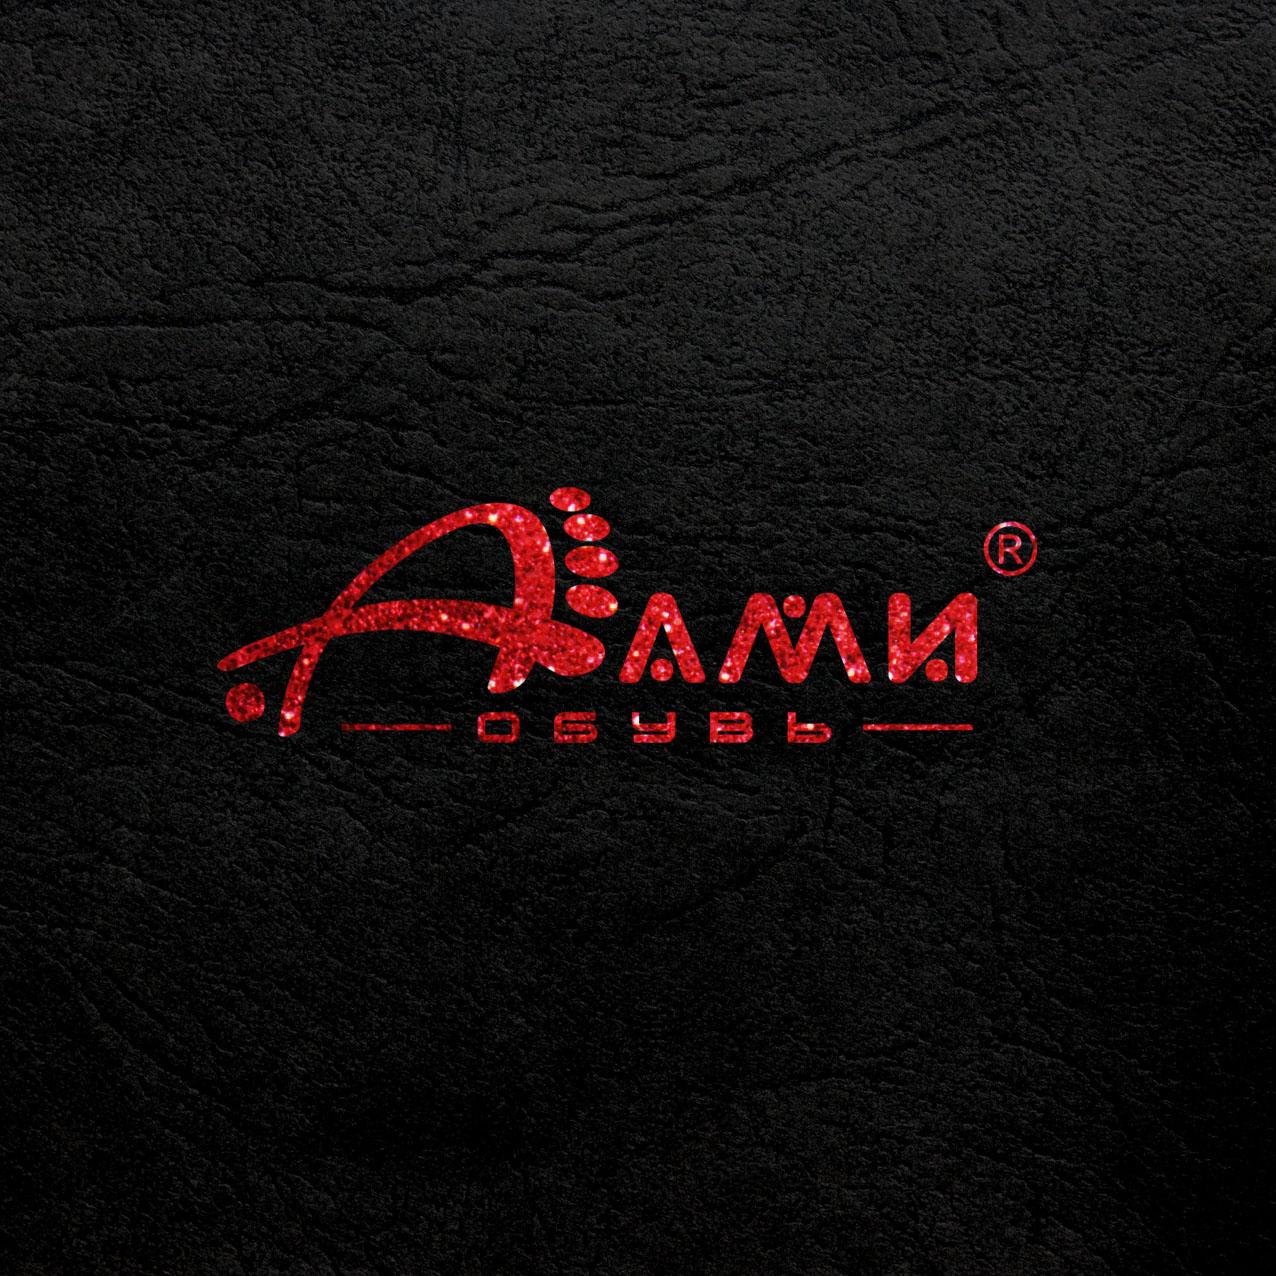 Дизайн логотипа обувной марки Алми фото f_65459f1d24032935.jpg